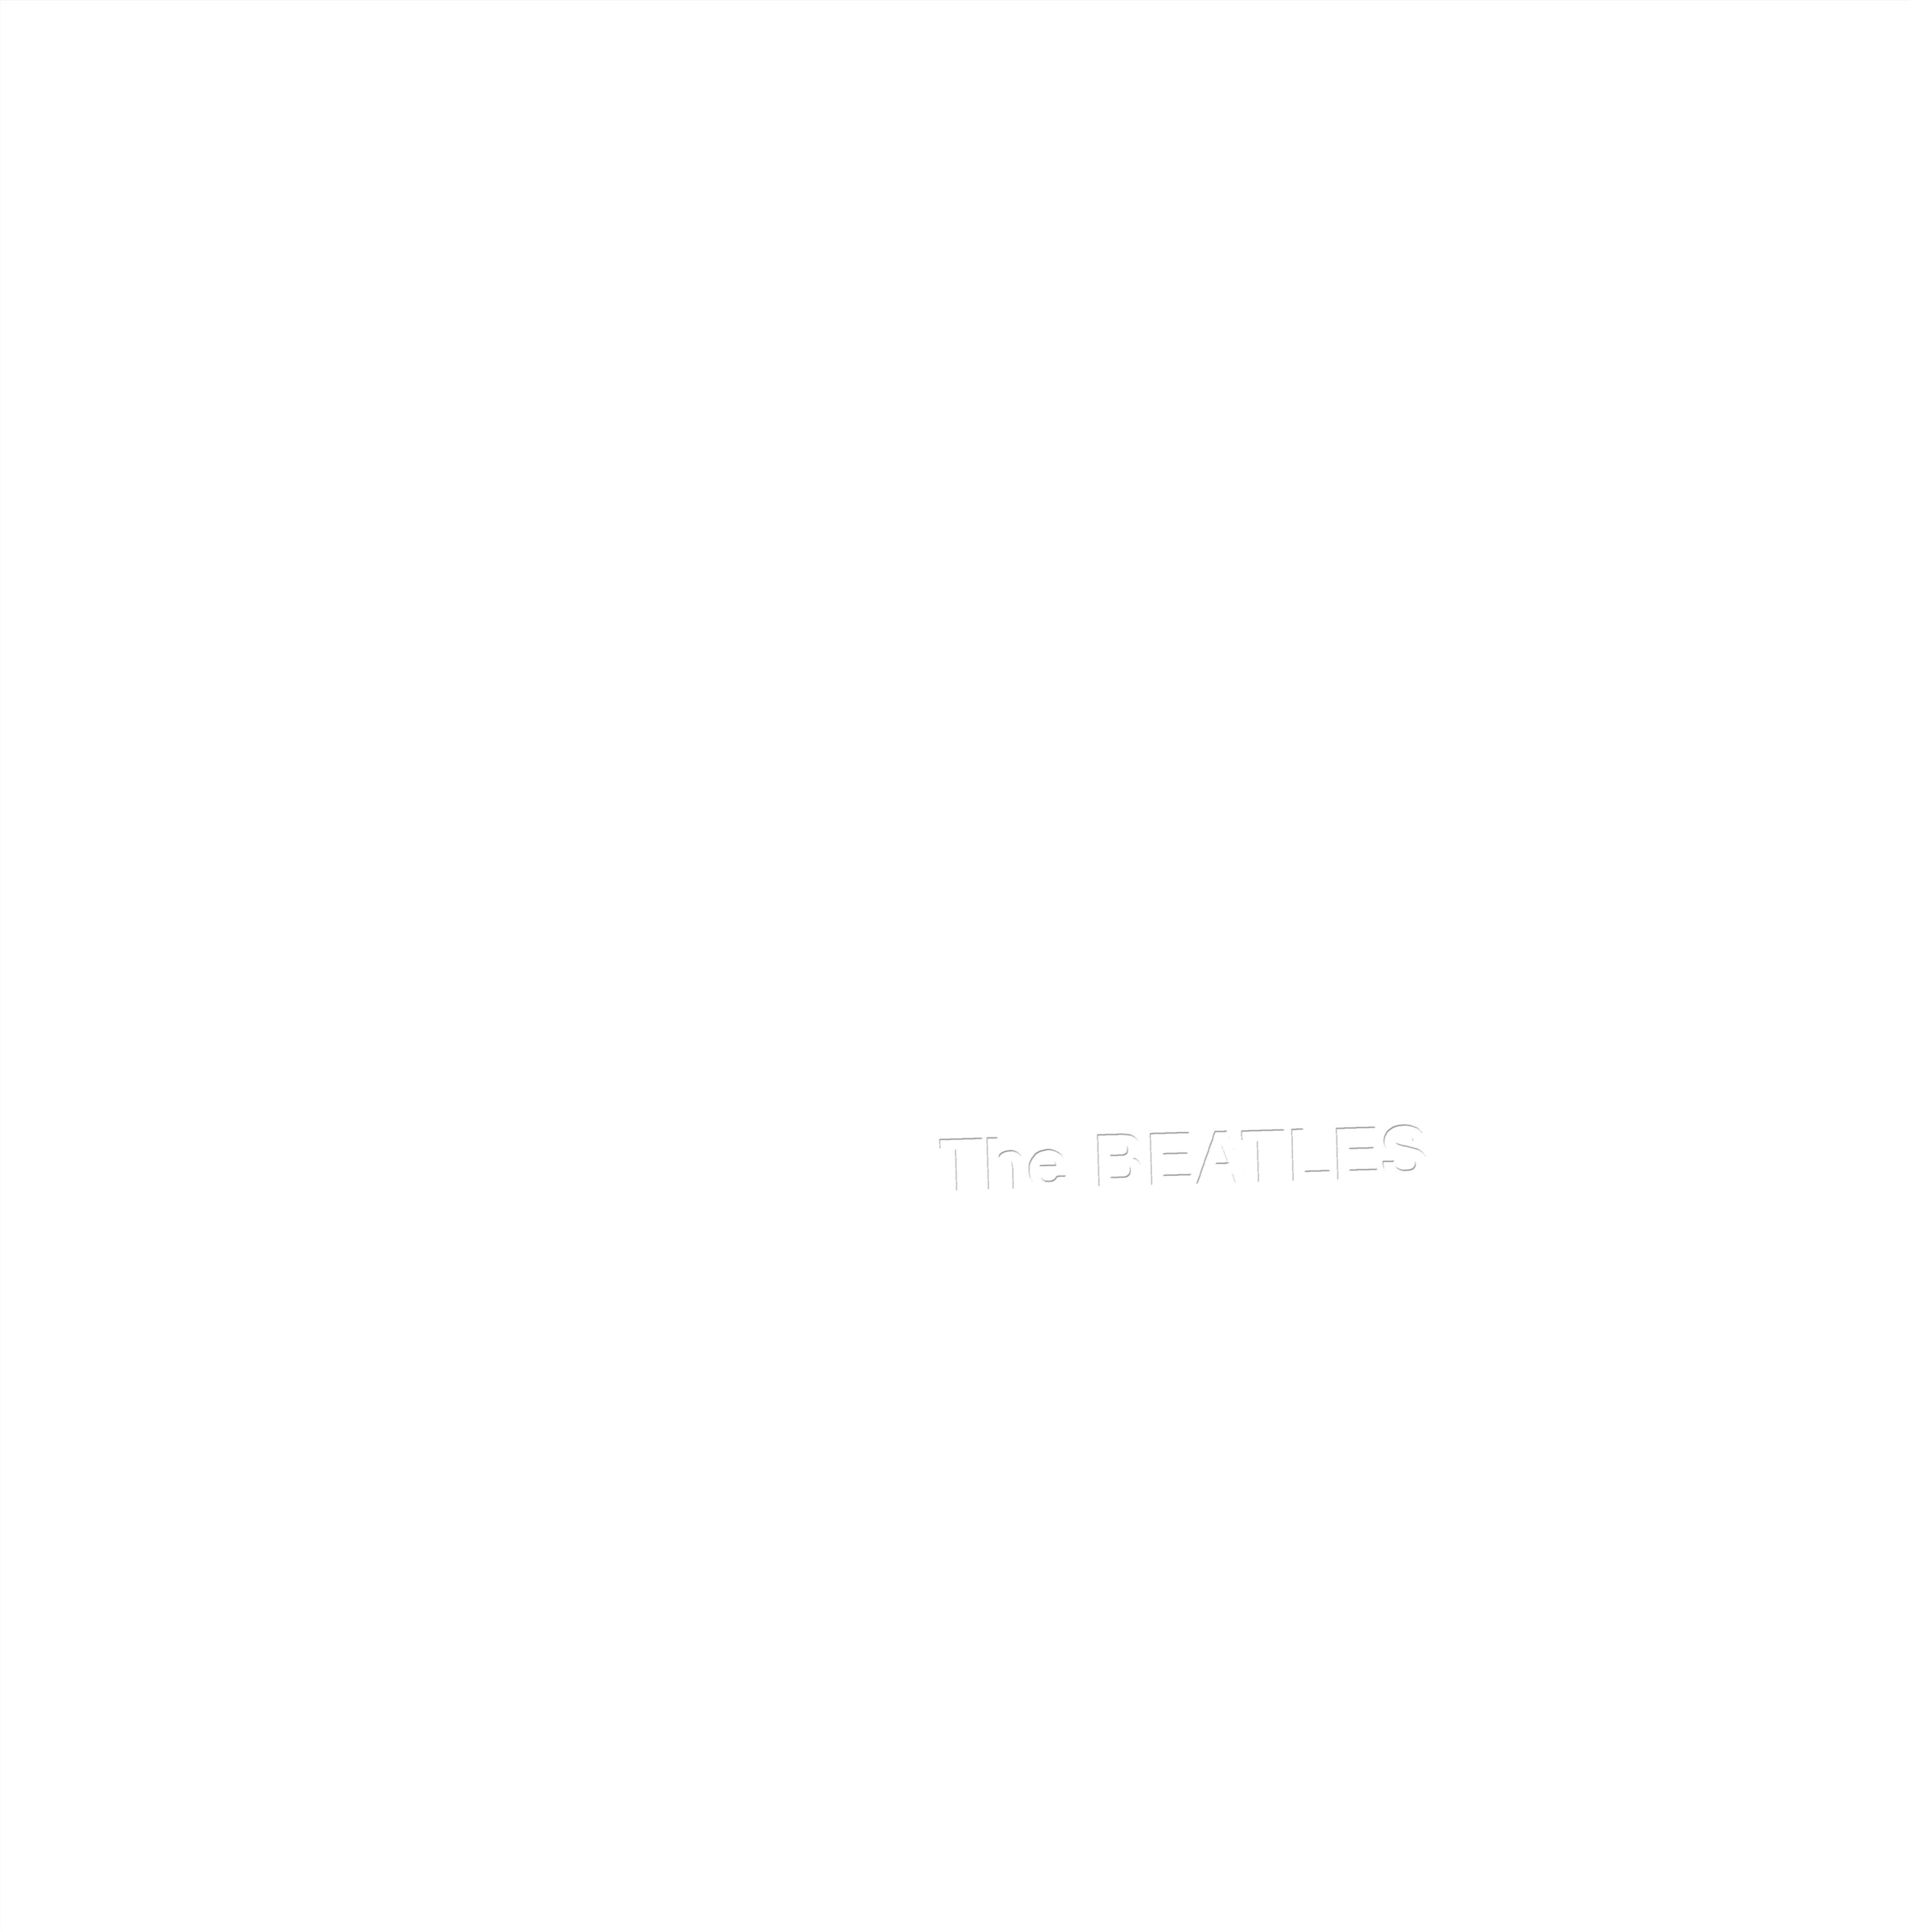 The Beatles (White album (Super deluxe edition))